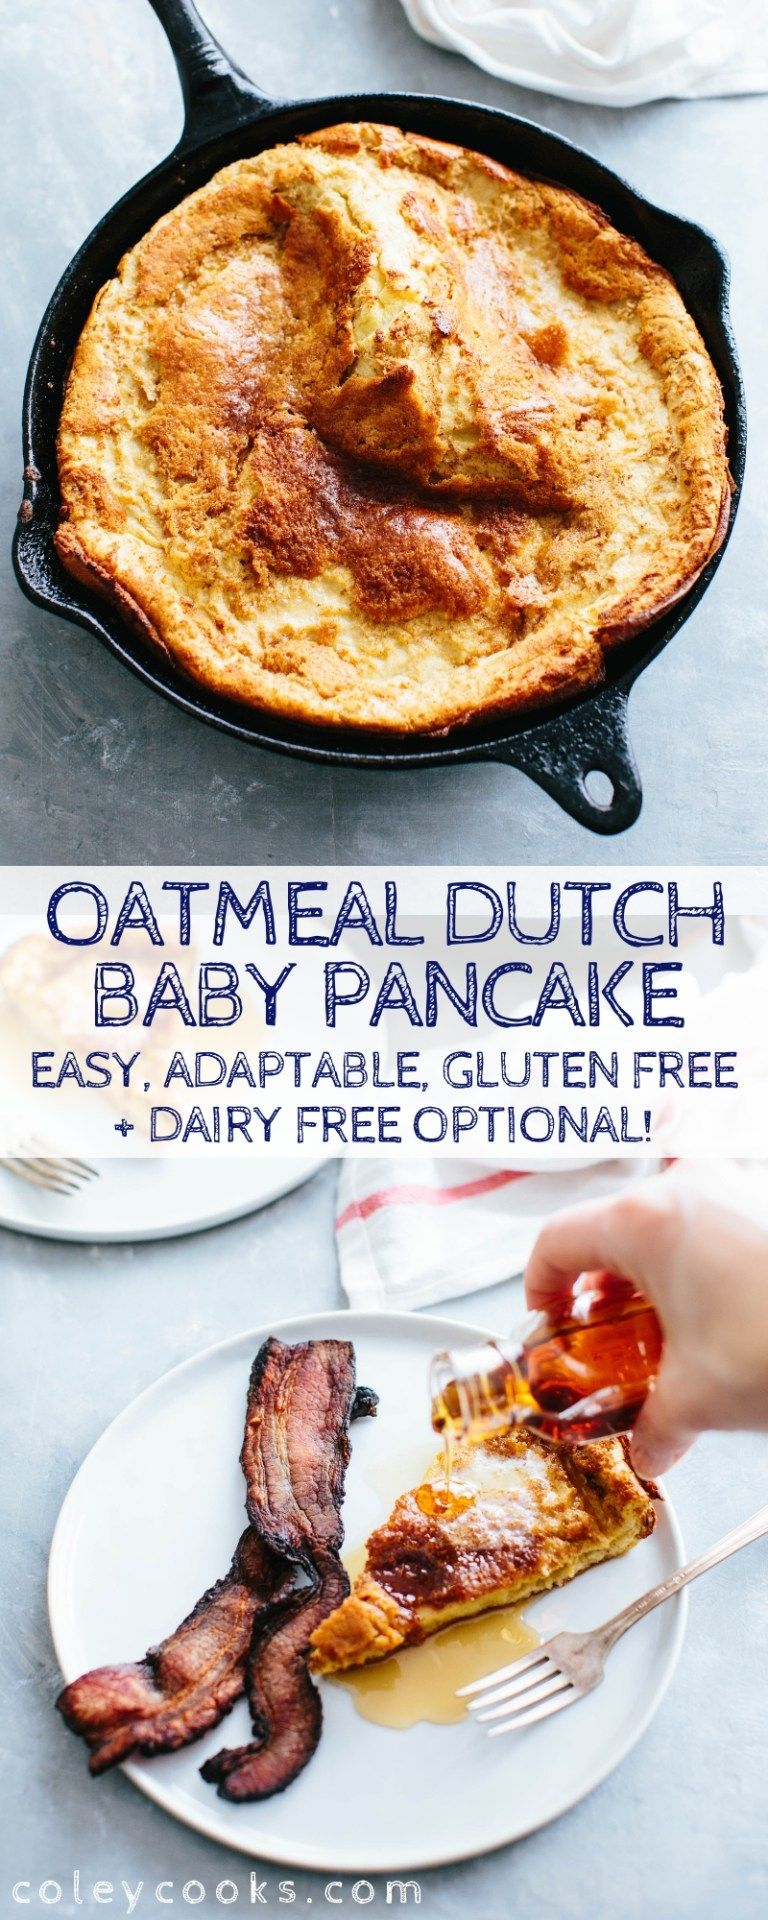 Oatmeal Dutch Baby Pancake   Recipe in 2020   Food ...